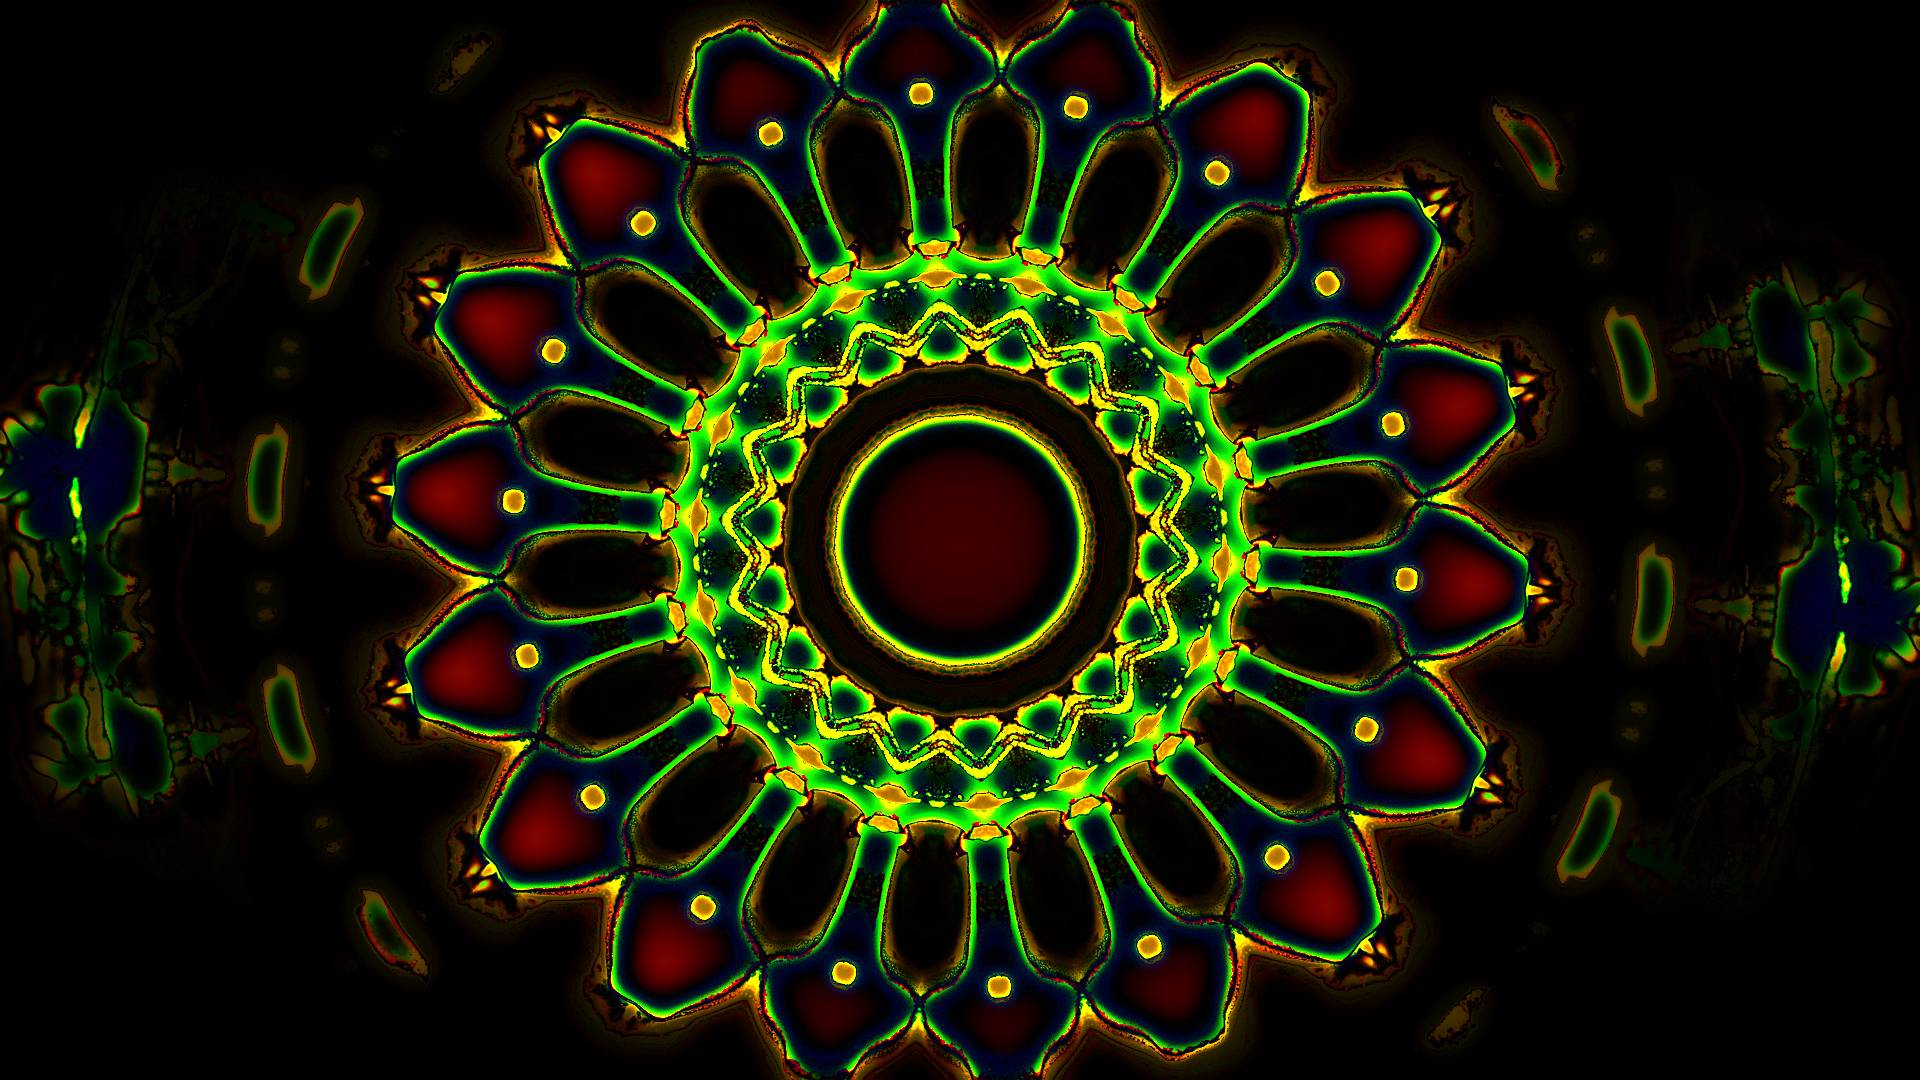 hd green trippy wallpaper - supportive guru